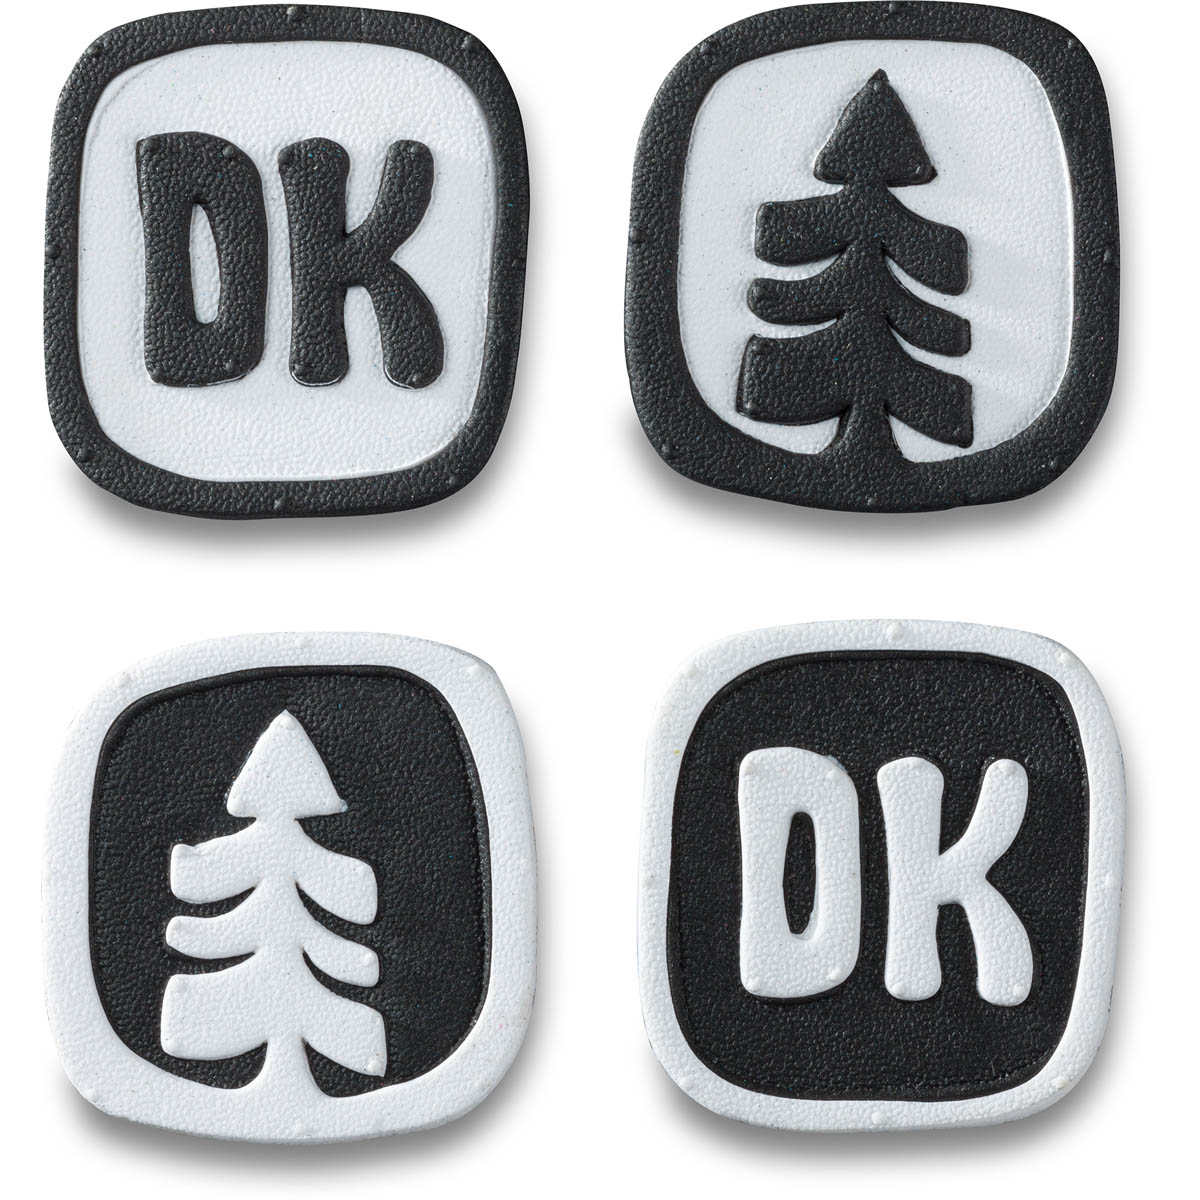 29325fce890 Dakine Dk Dots Stomp Pad Black / White | Dakine Shop